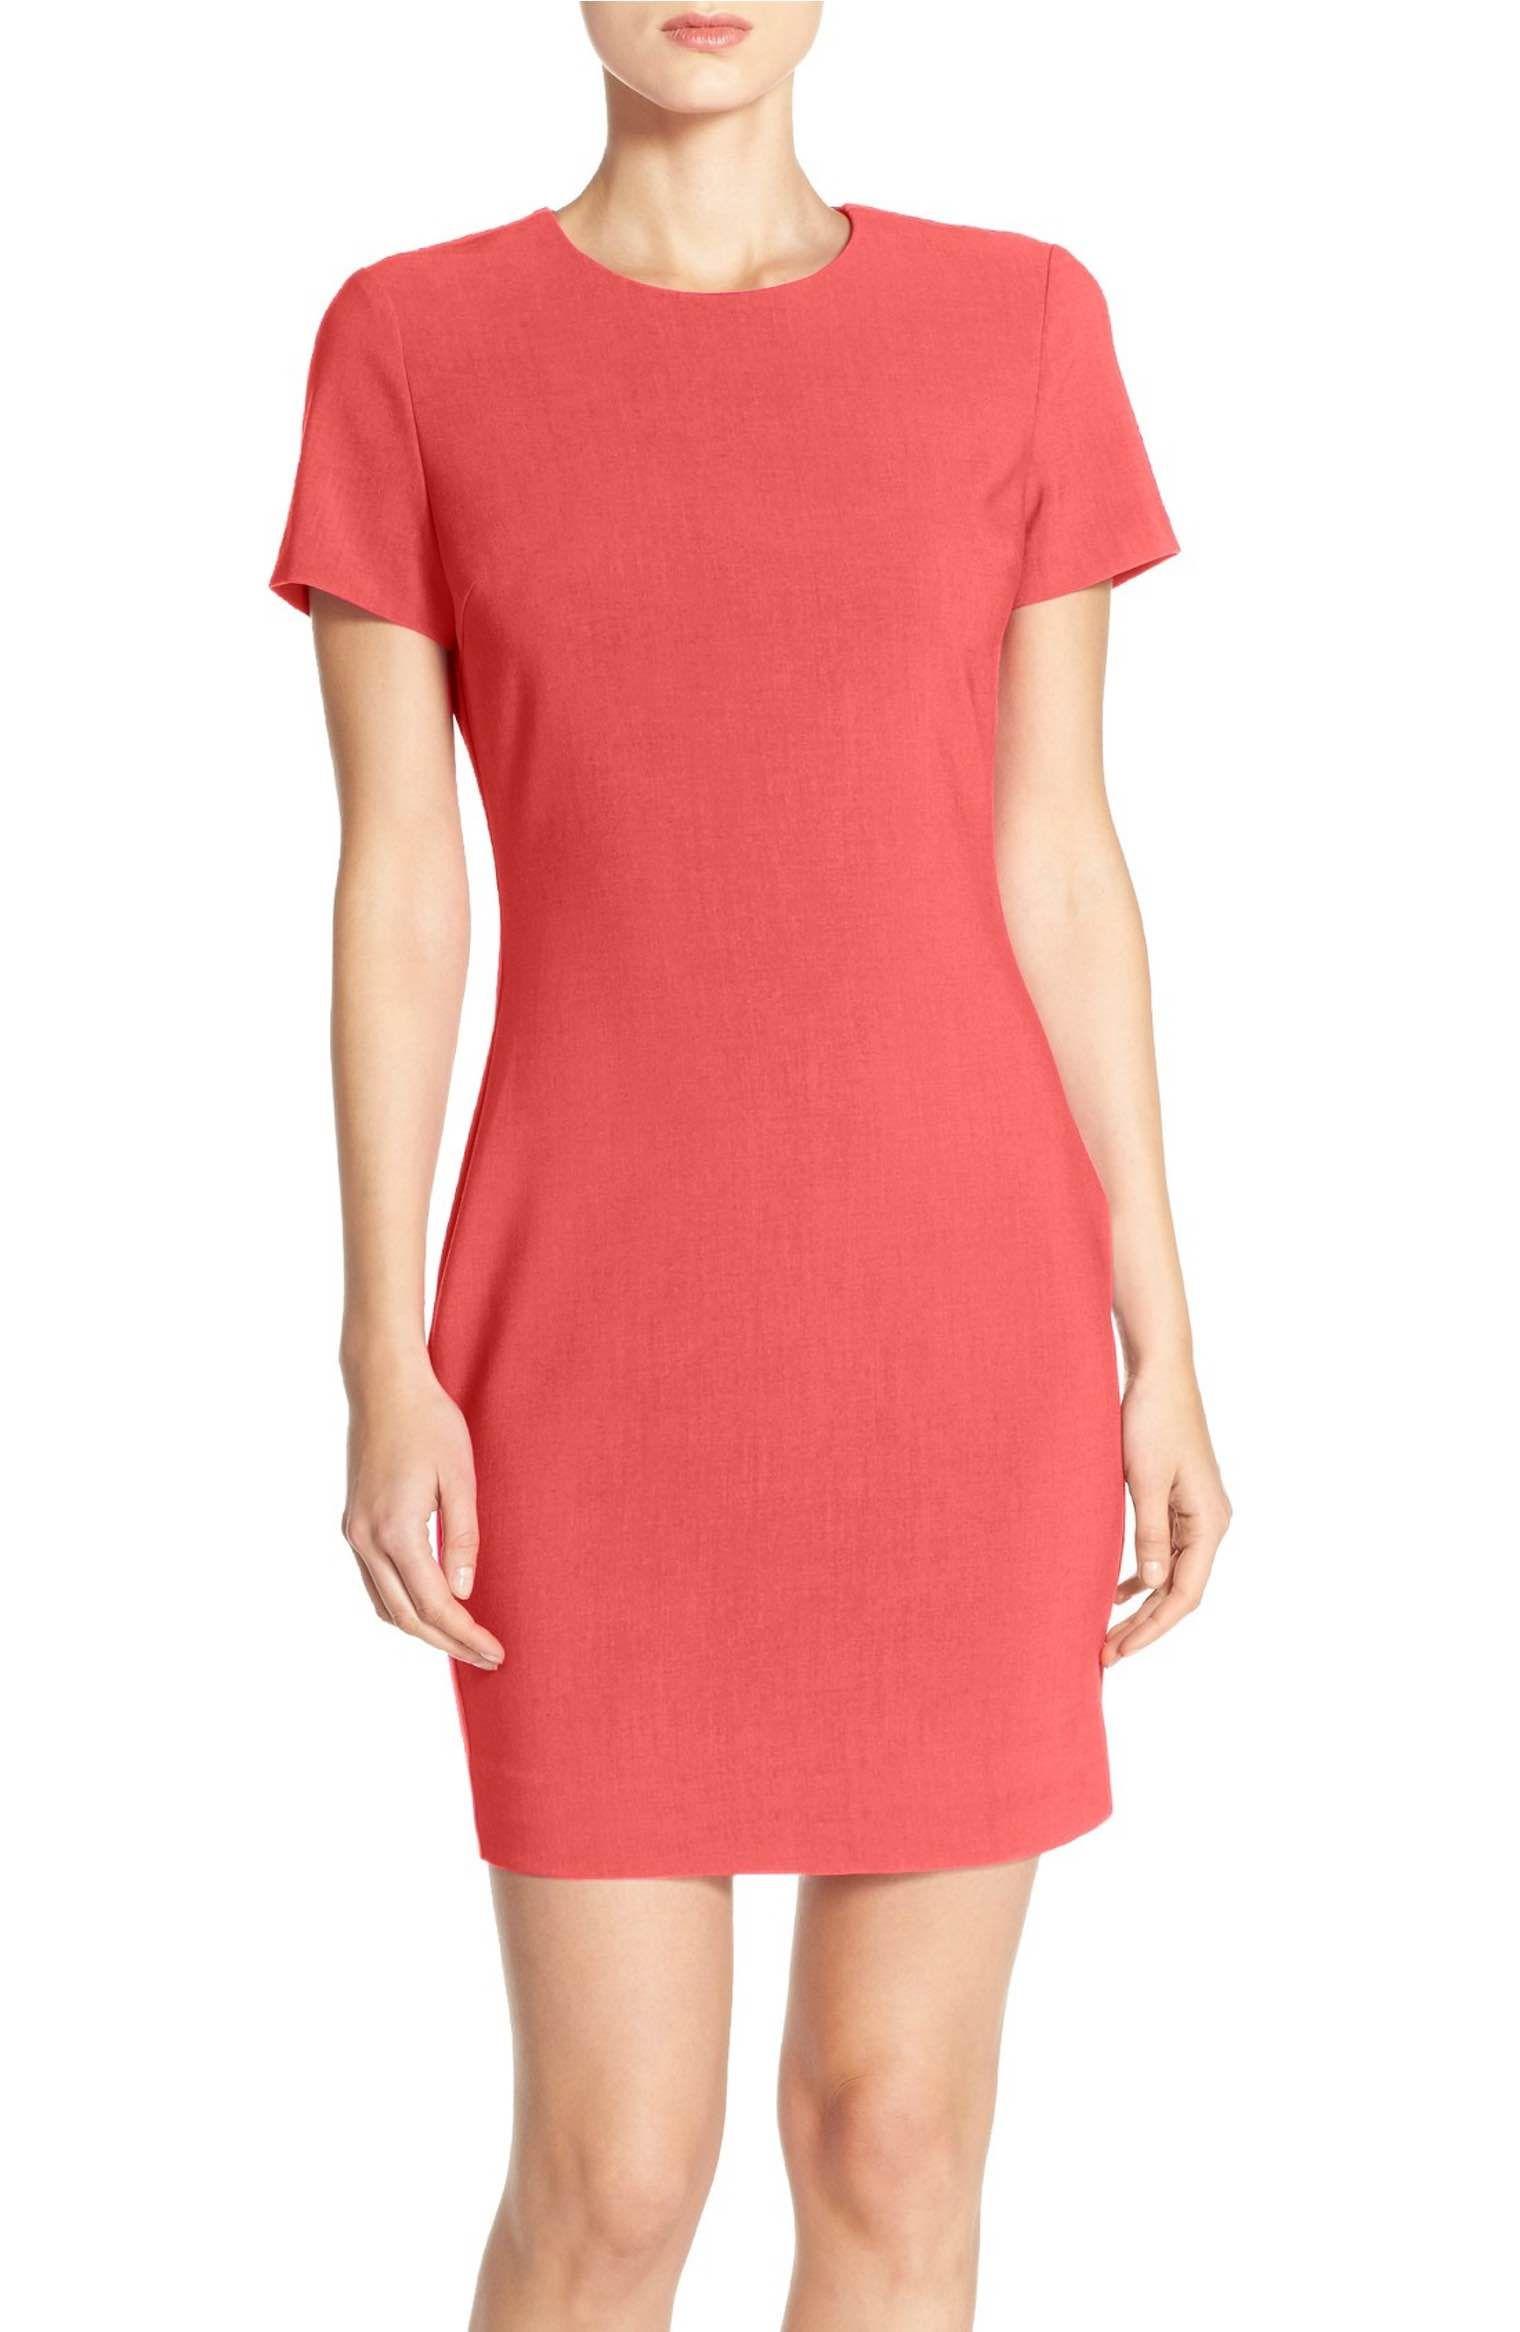 f08b6e6796f Main Image - Likely  Manhattan  Short Sleeve Sheath Dress